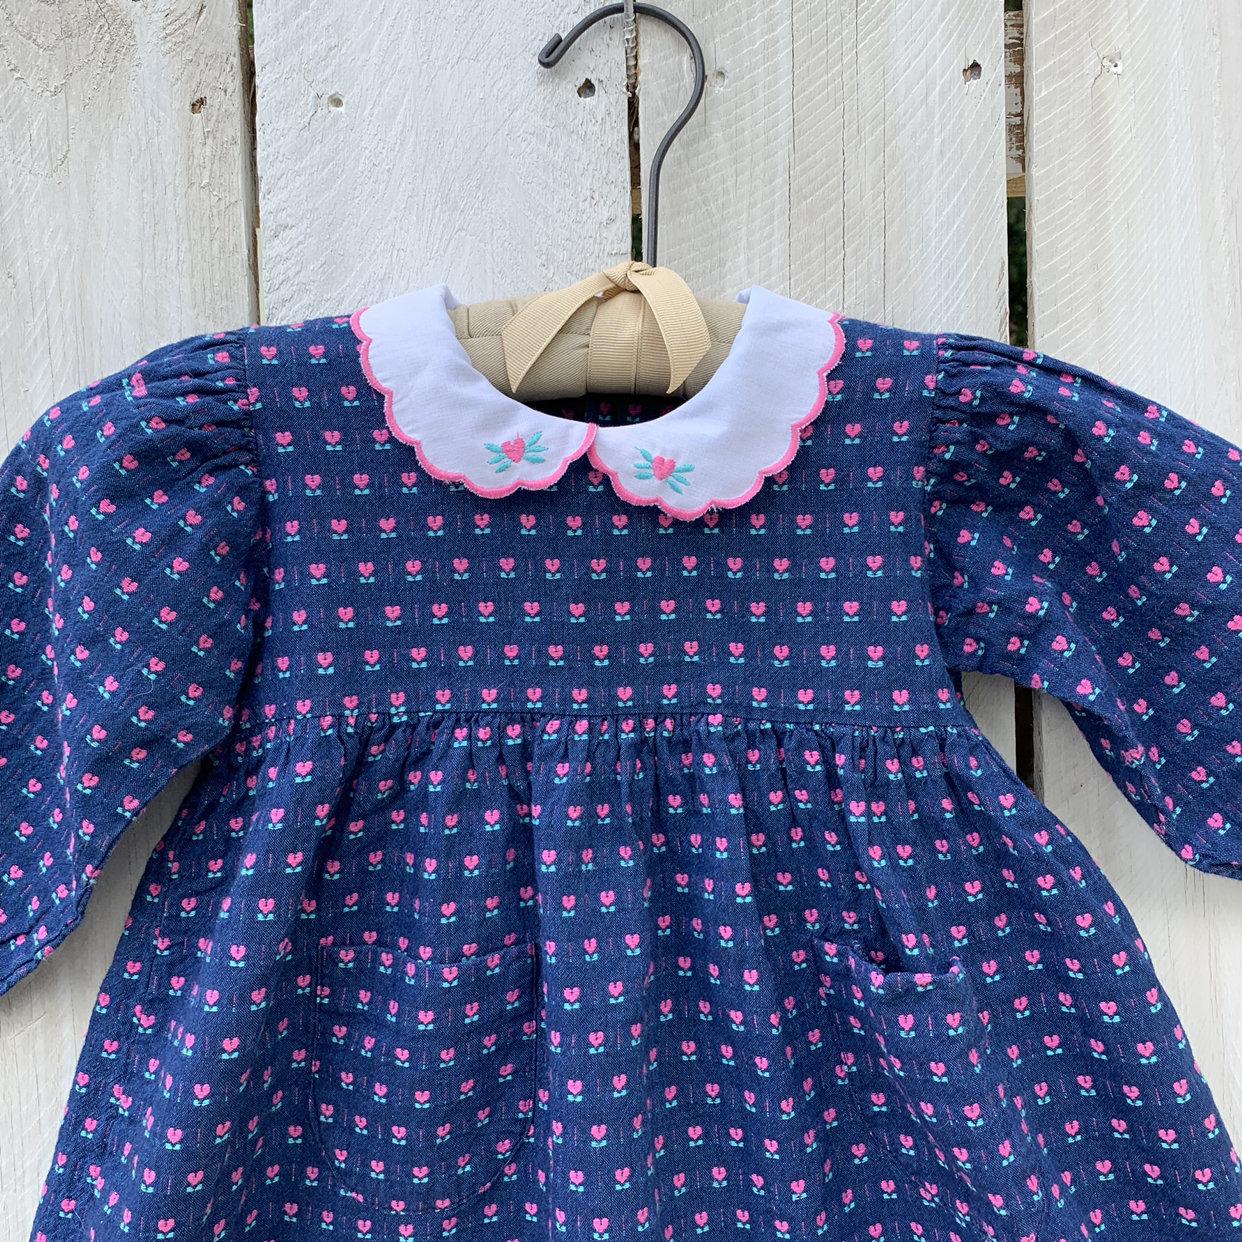 Vintage Kids 18-24 Month Jean Dress